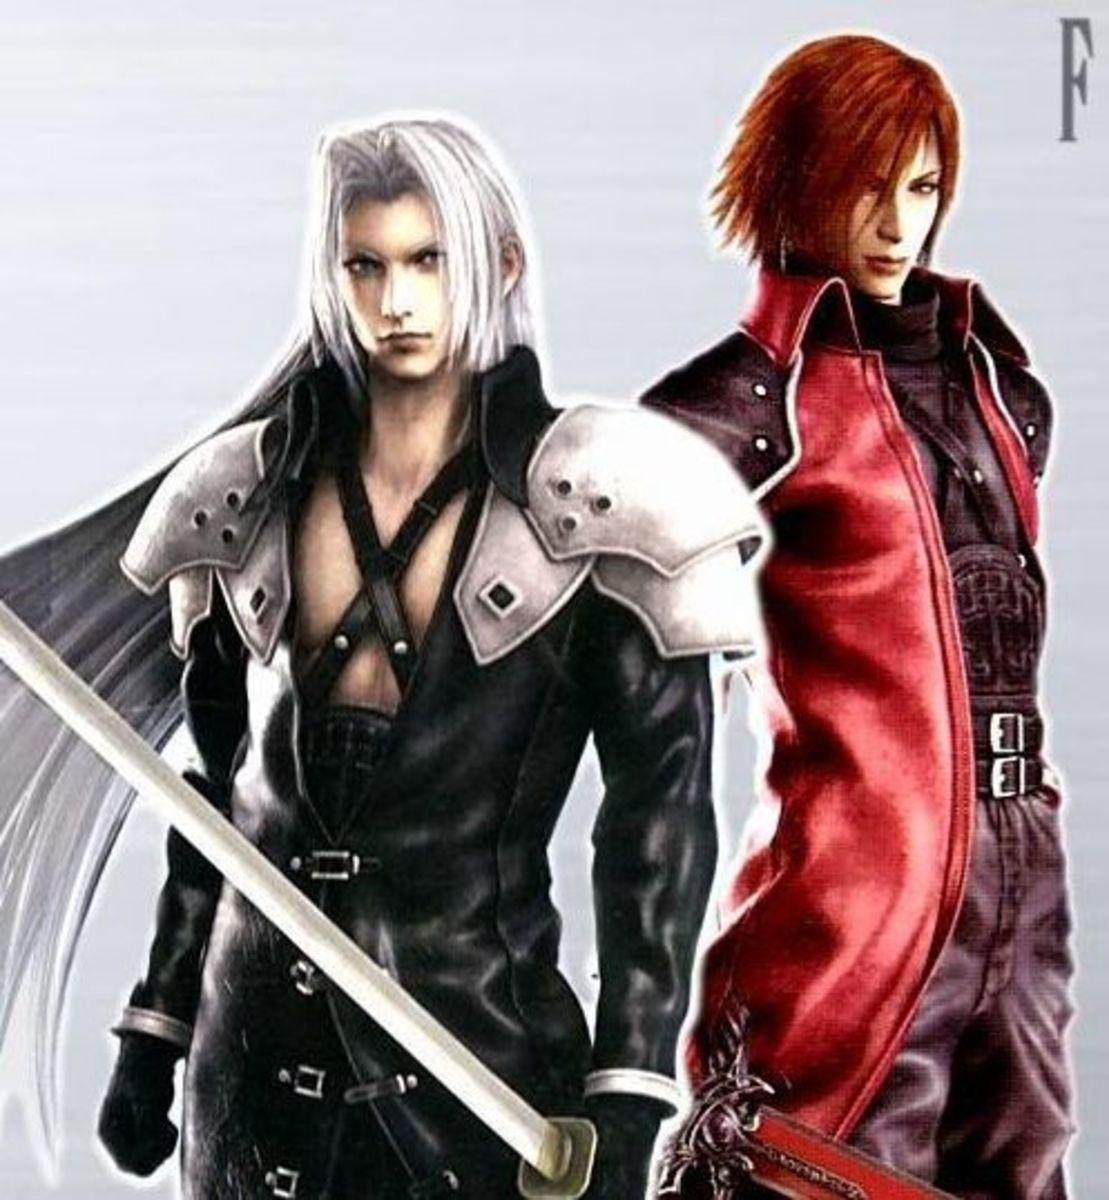 Final Fantasy characters